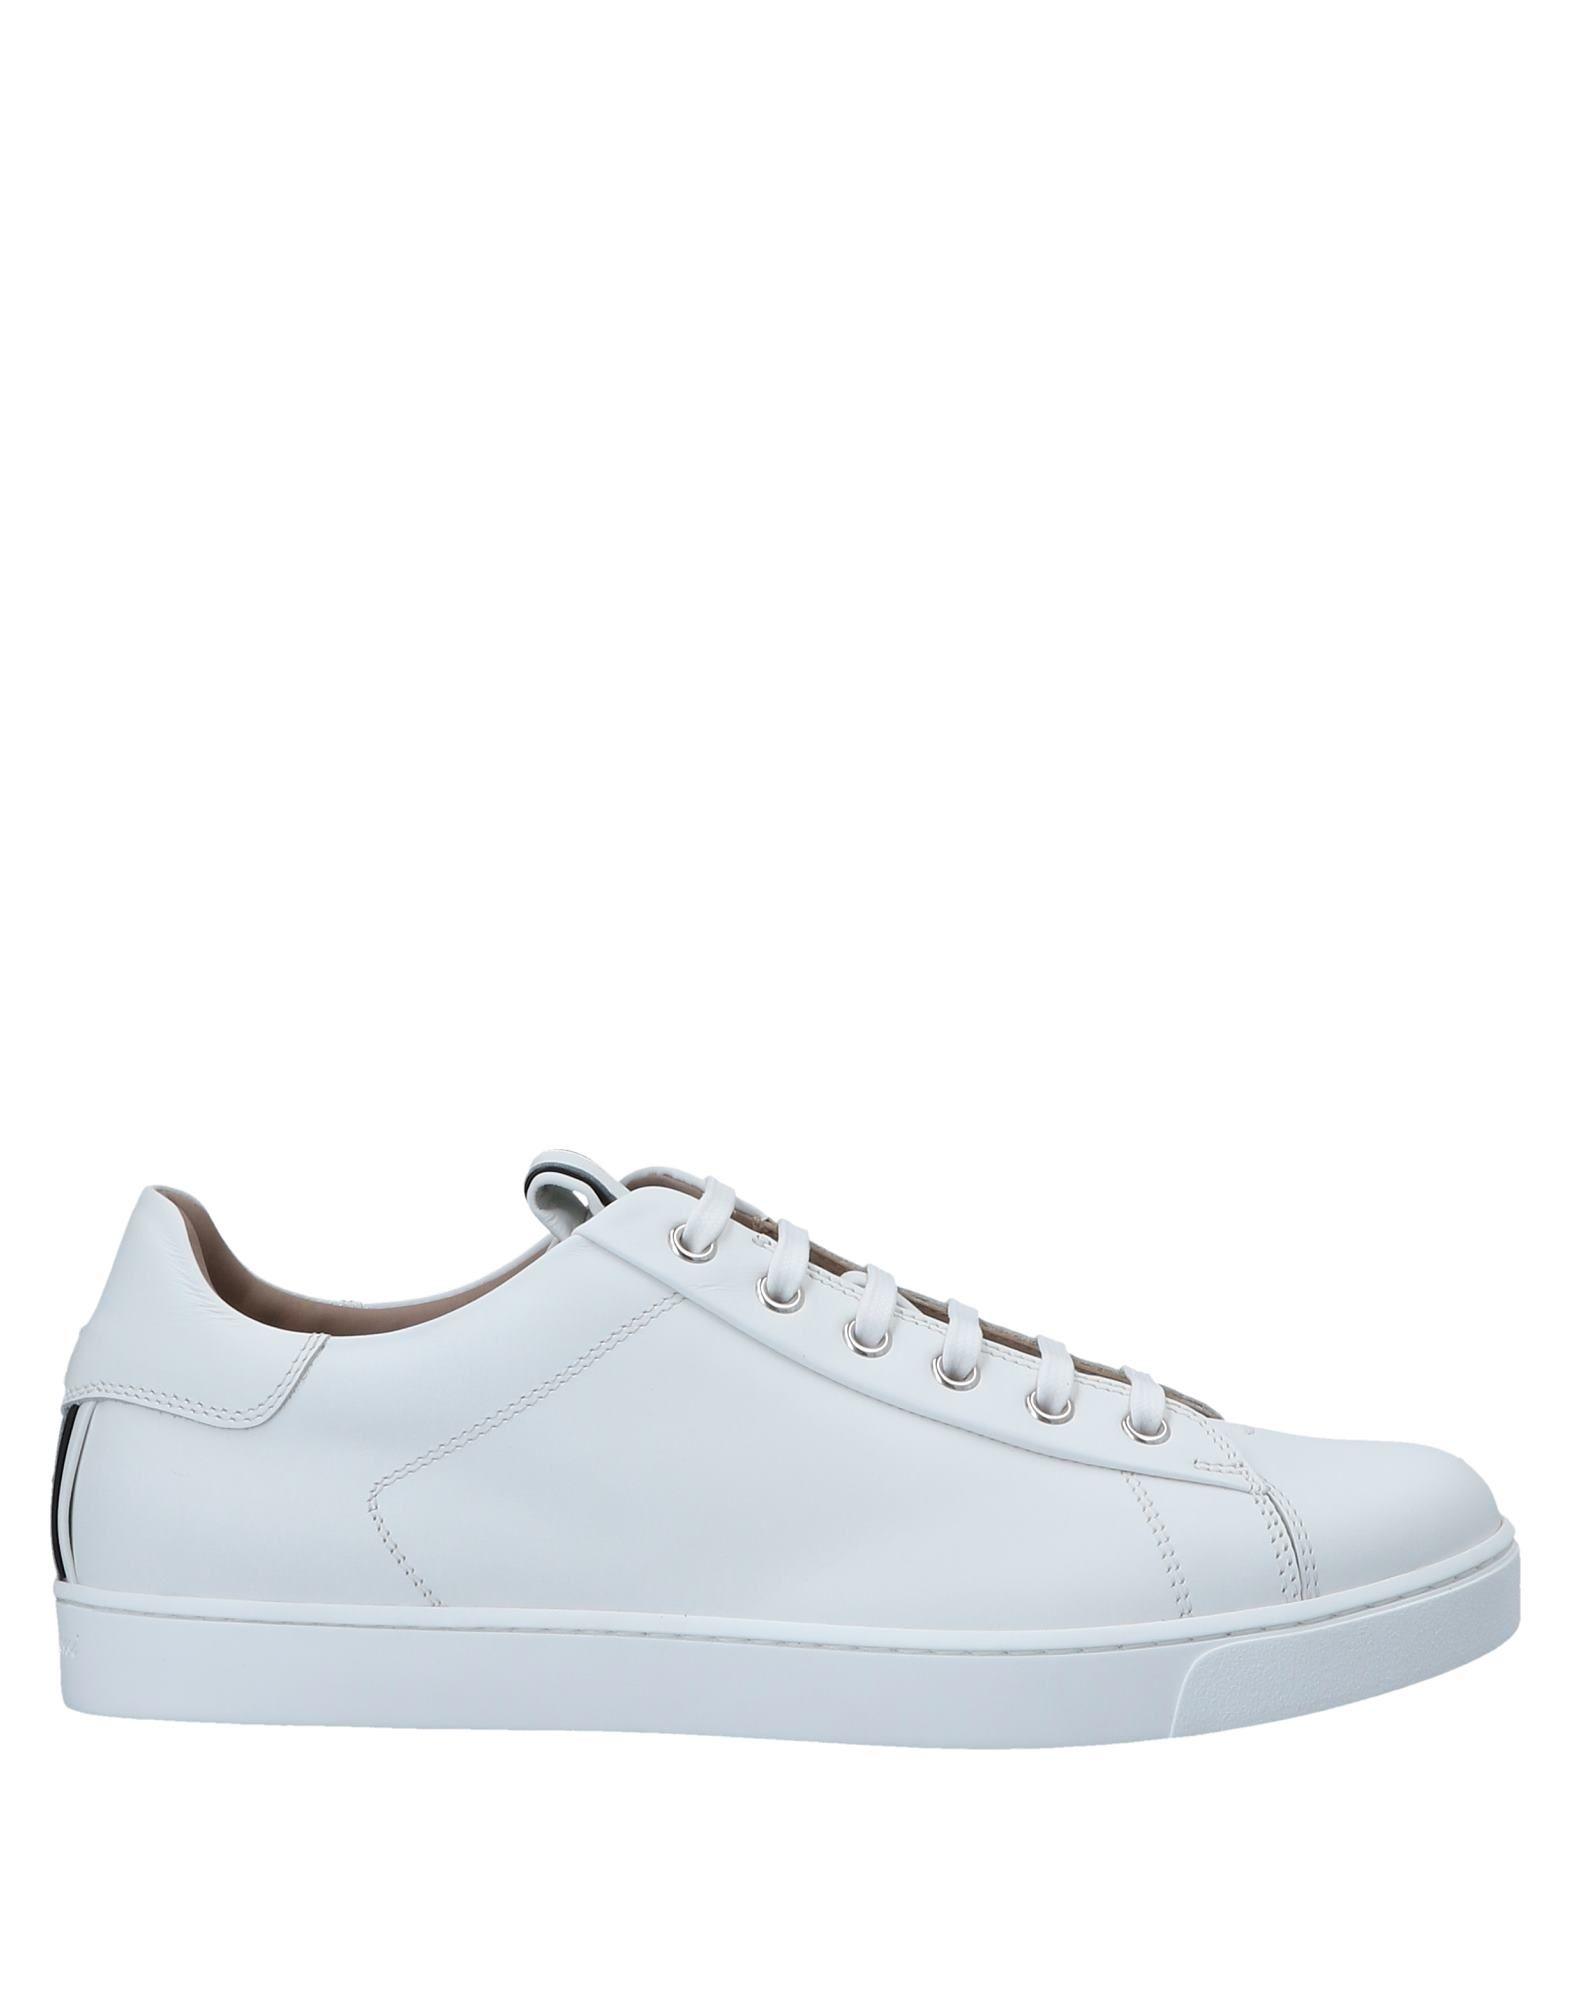 Gianvito 11501398VG Rossi Sneakers Herren  11501398VG Gianvito Gute Qualität beliebte Schuhe 26e6e7